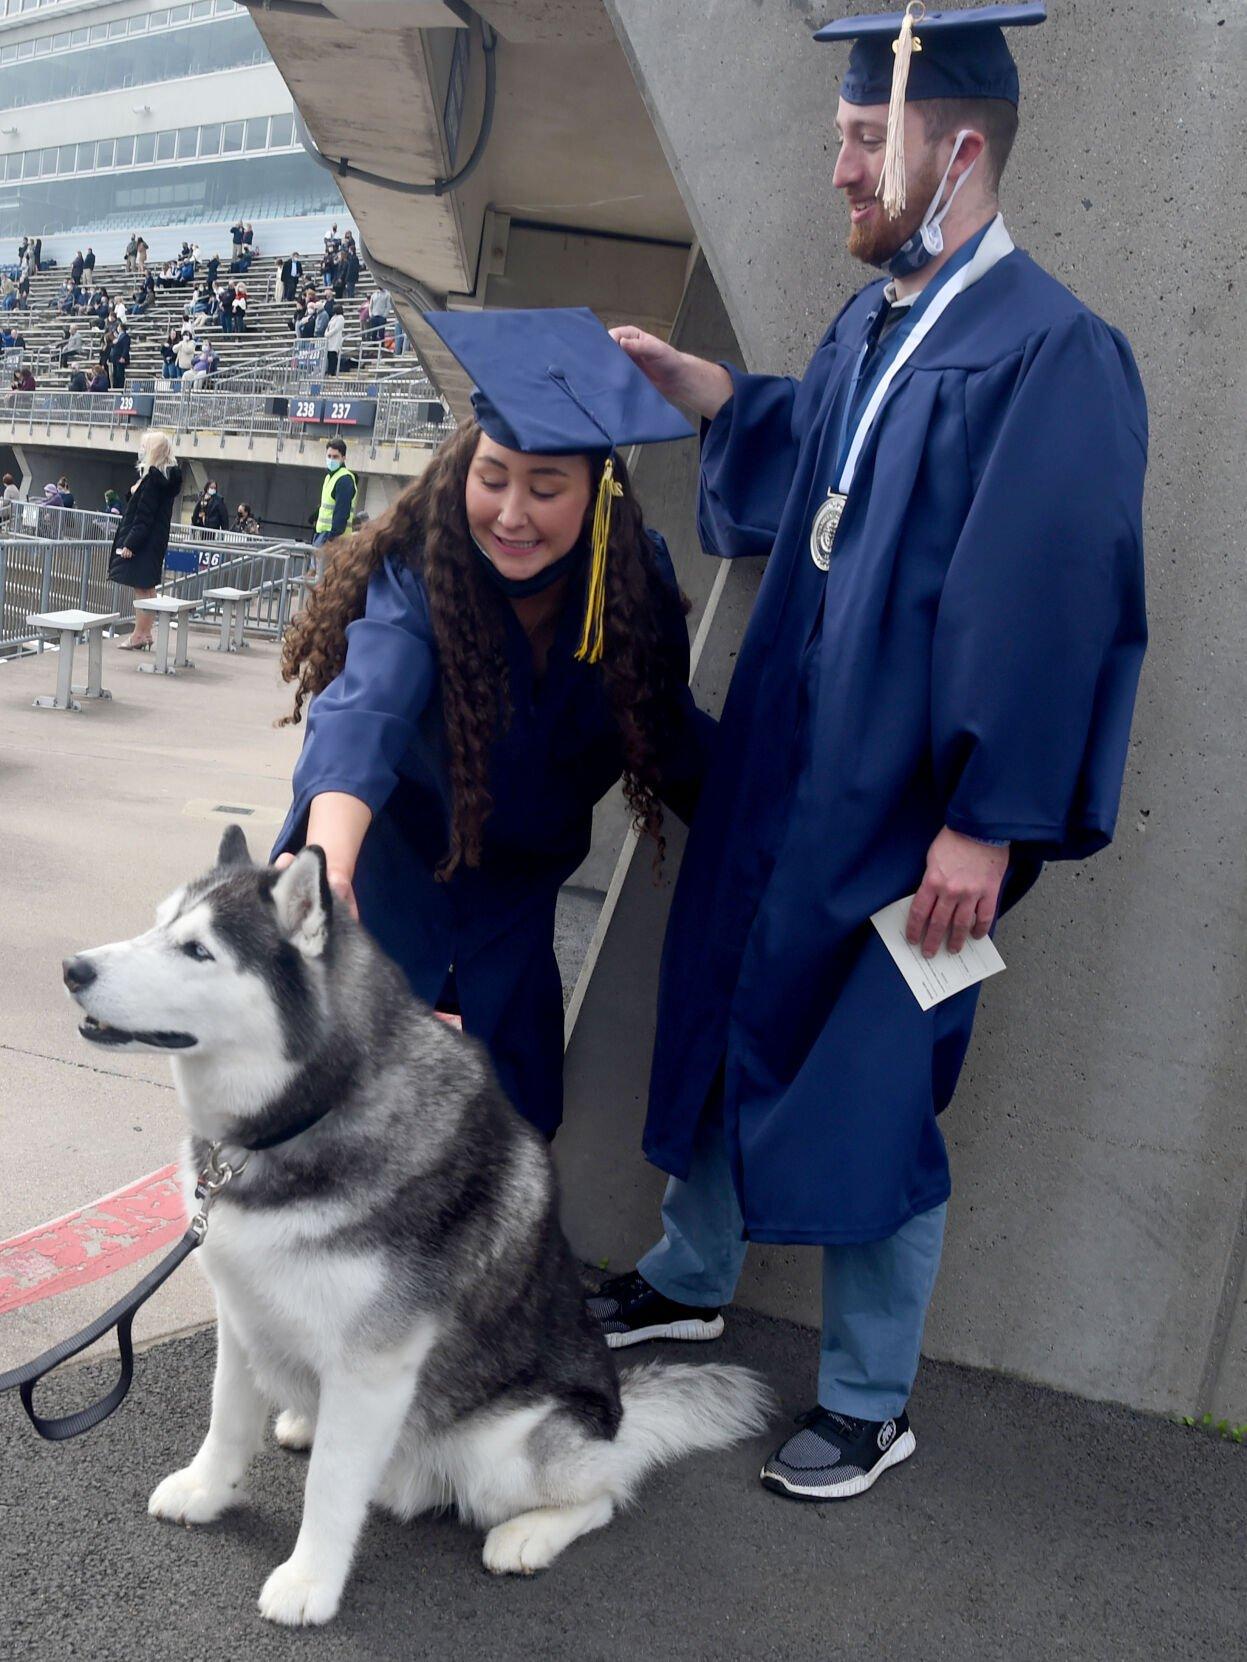 050821 EH UConn Graduation 05.jpg